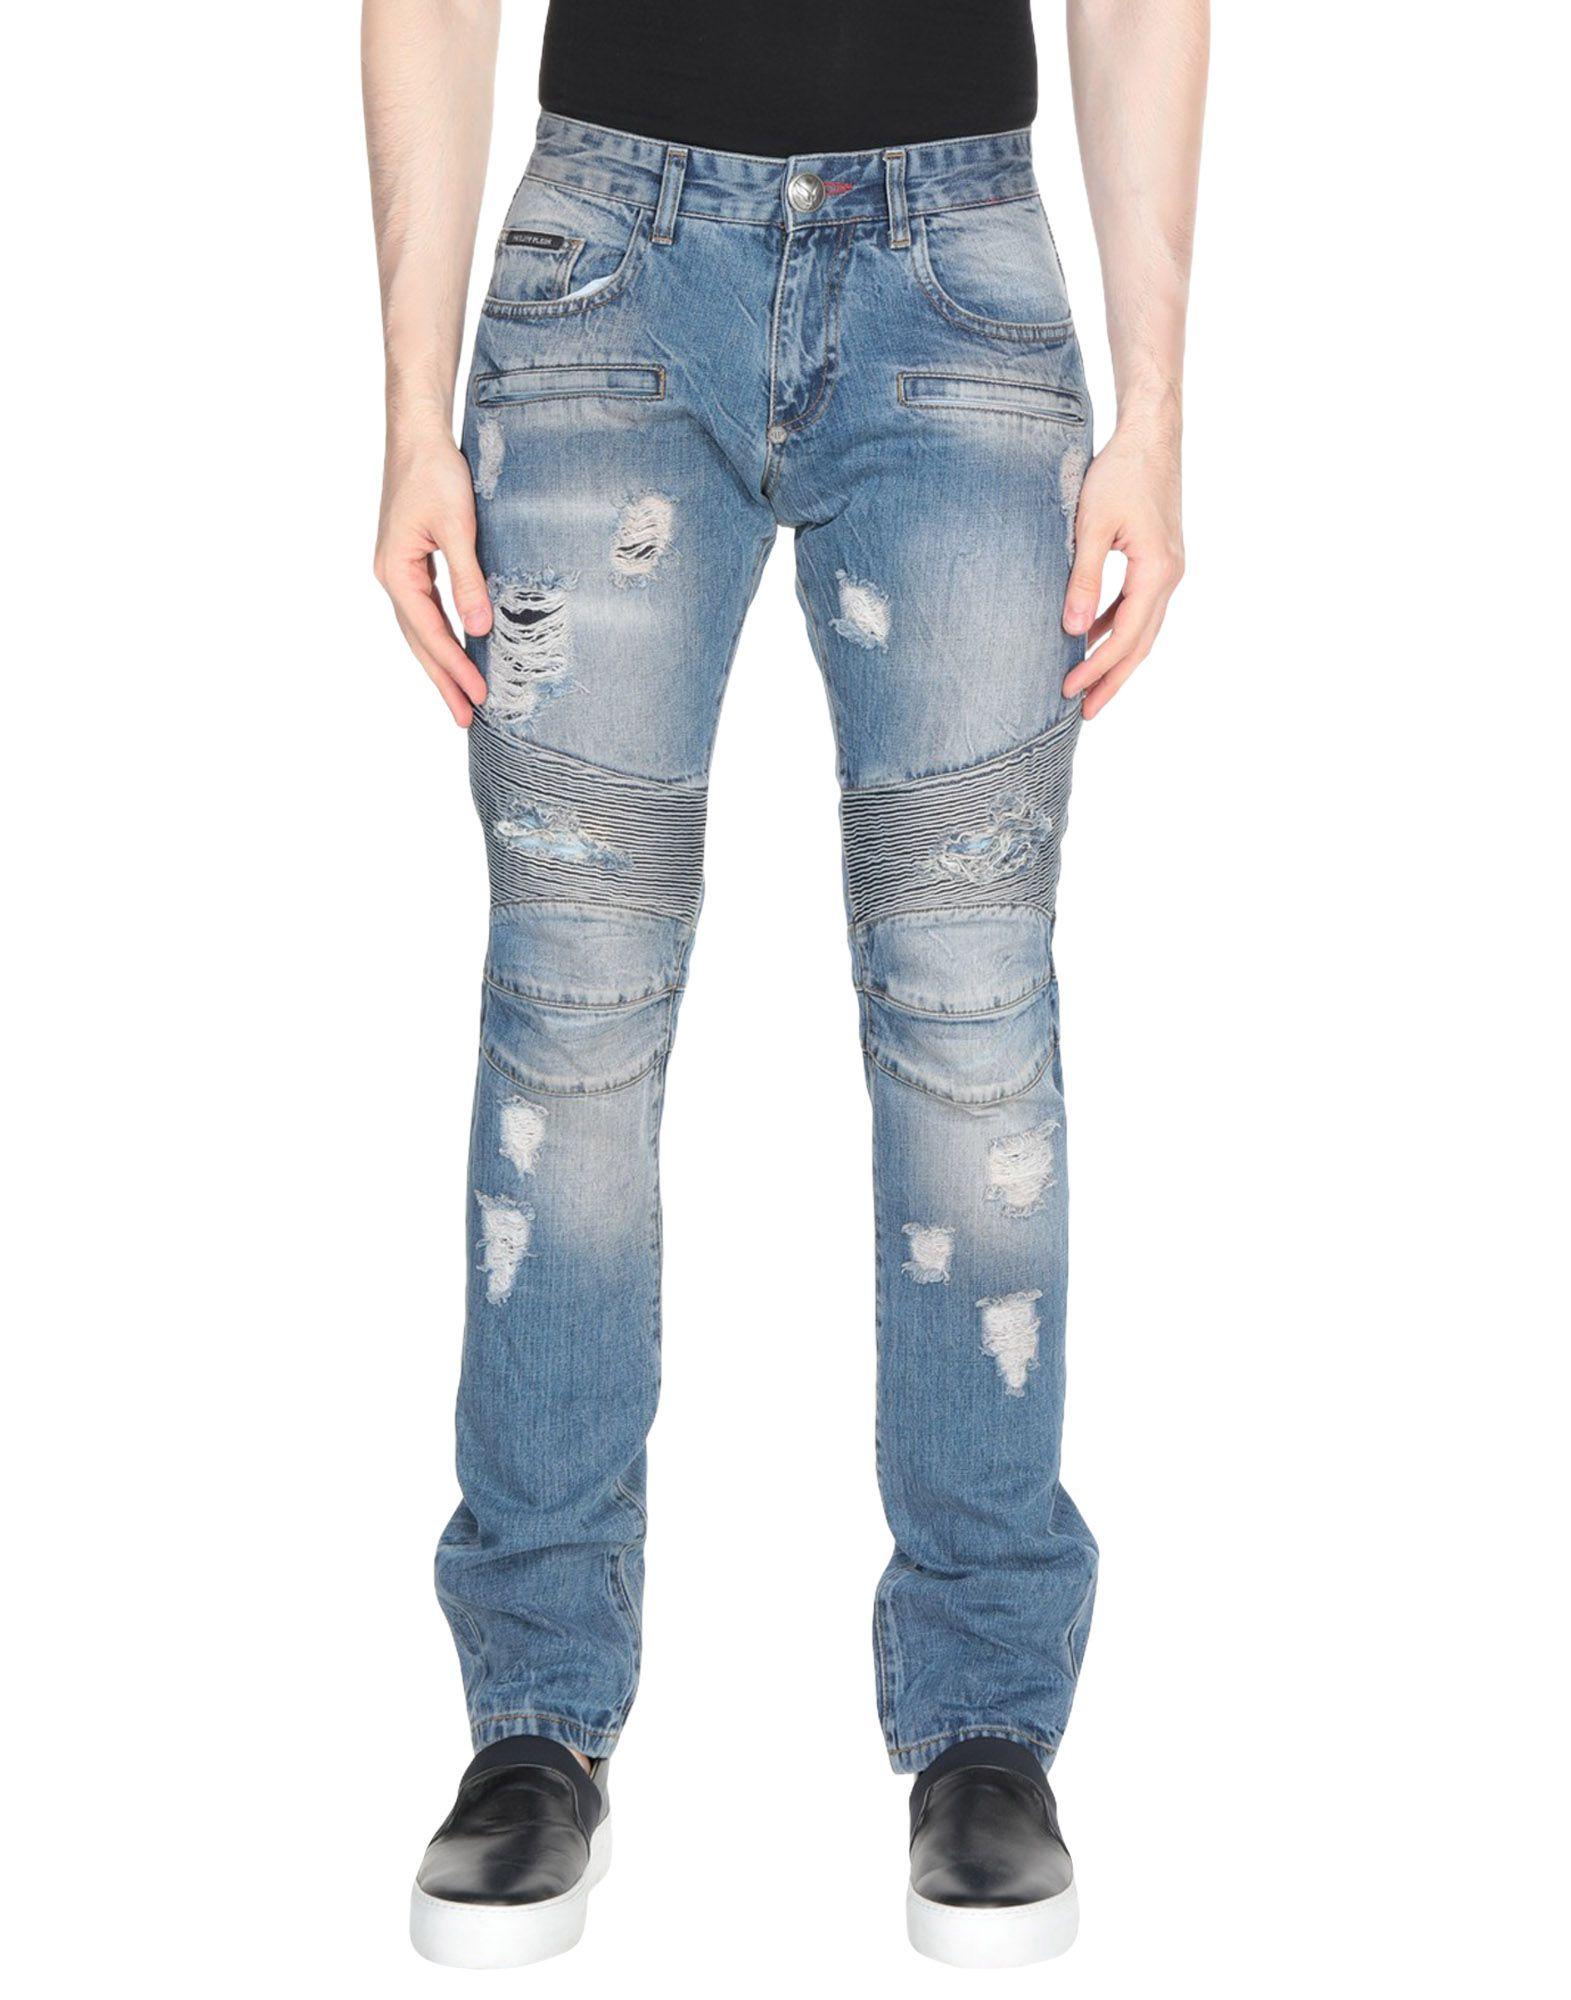 Pantaloni Jeans - Philipp Plein Uomo - Jeans 42685630BO 3af481